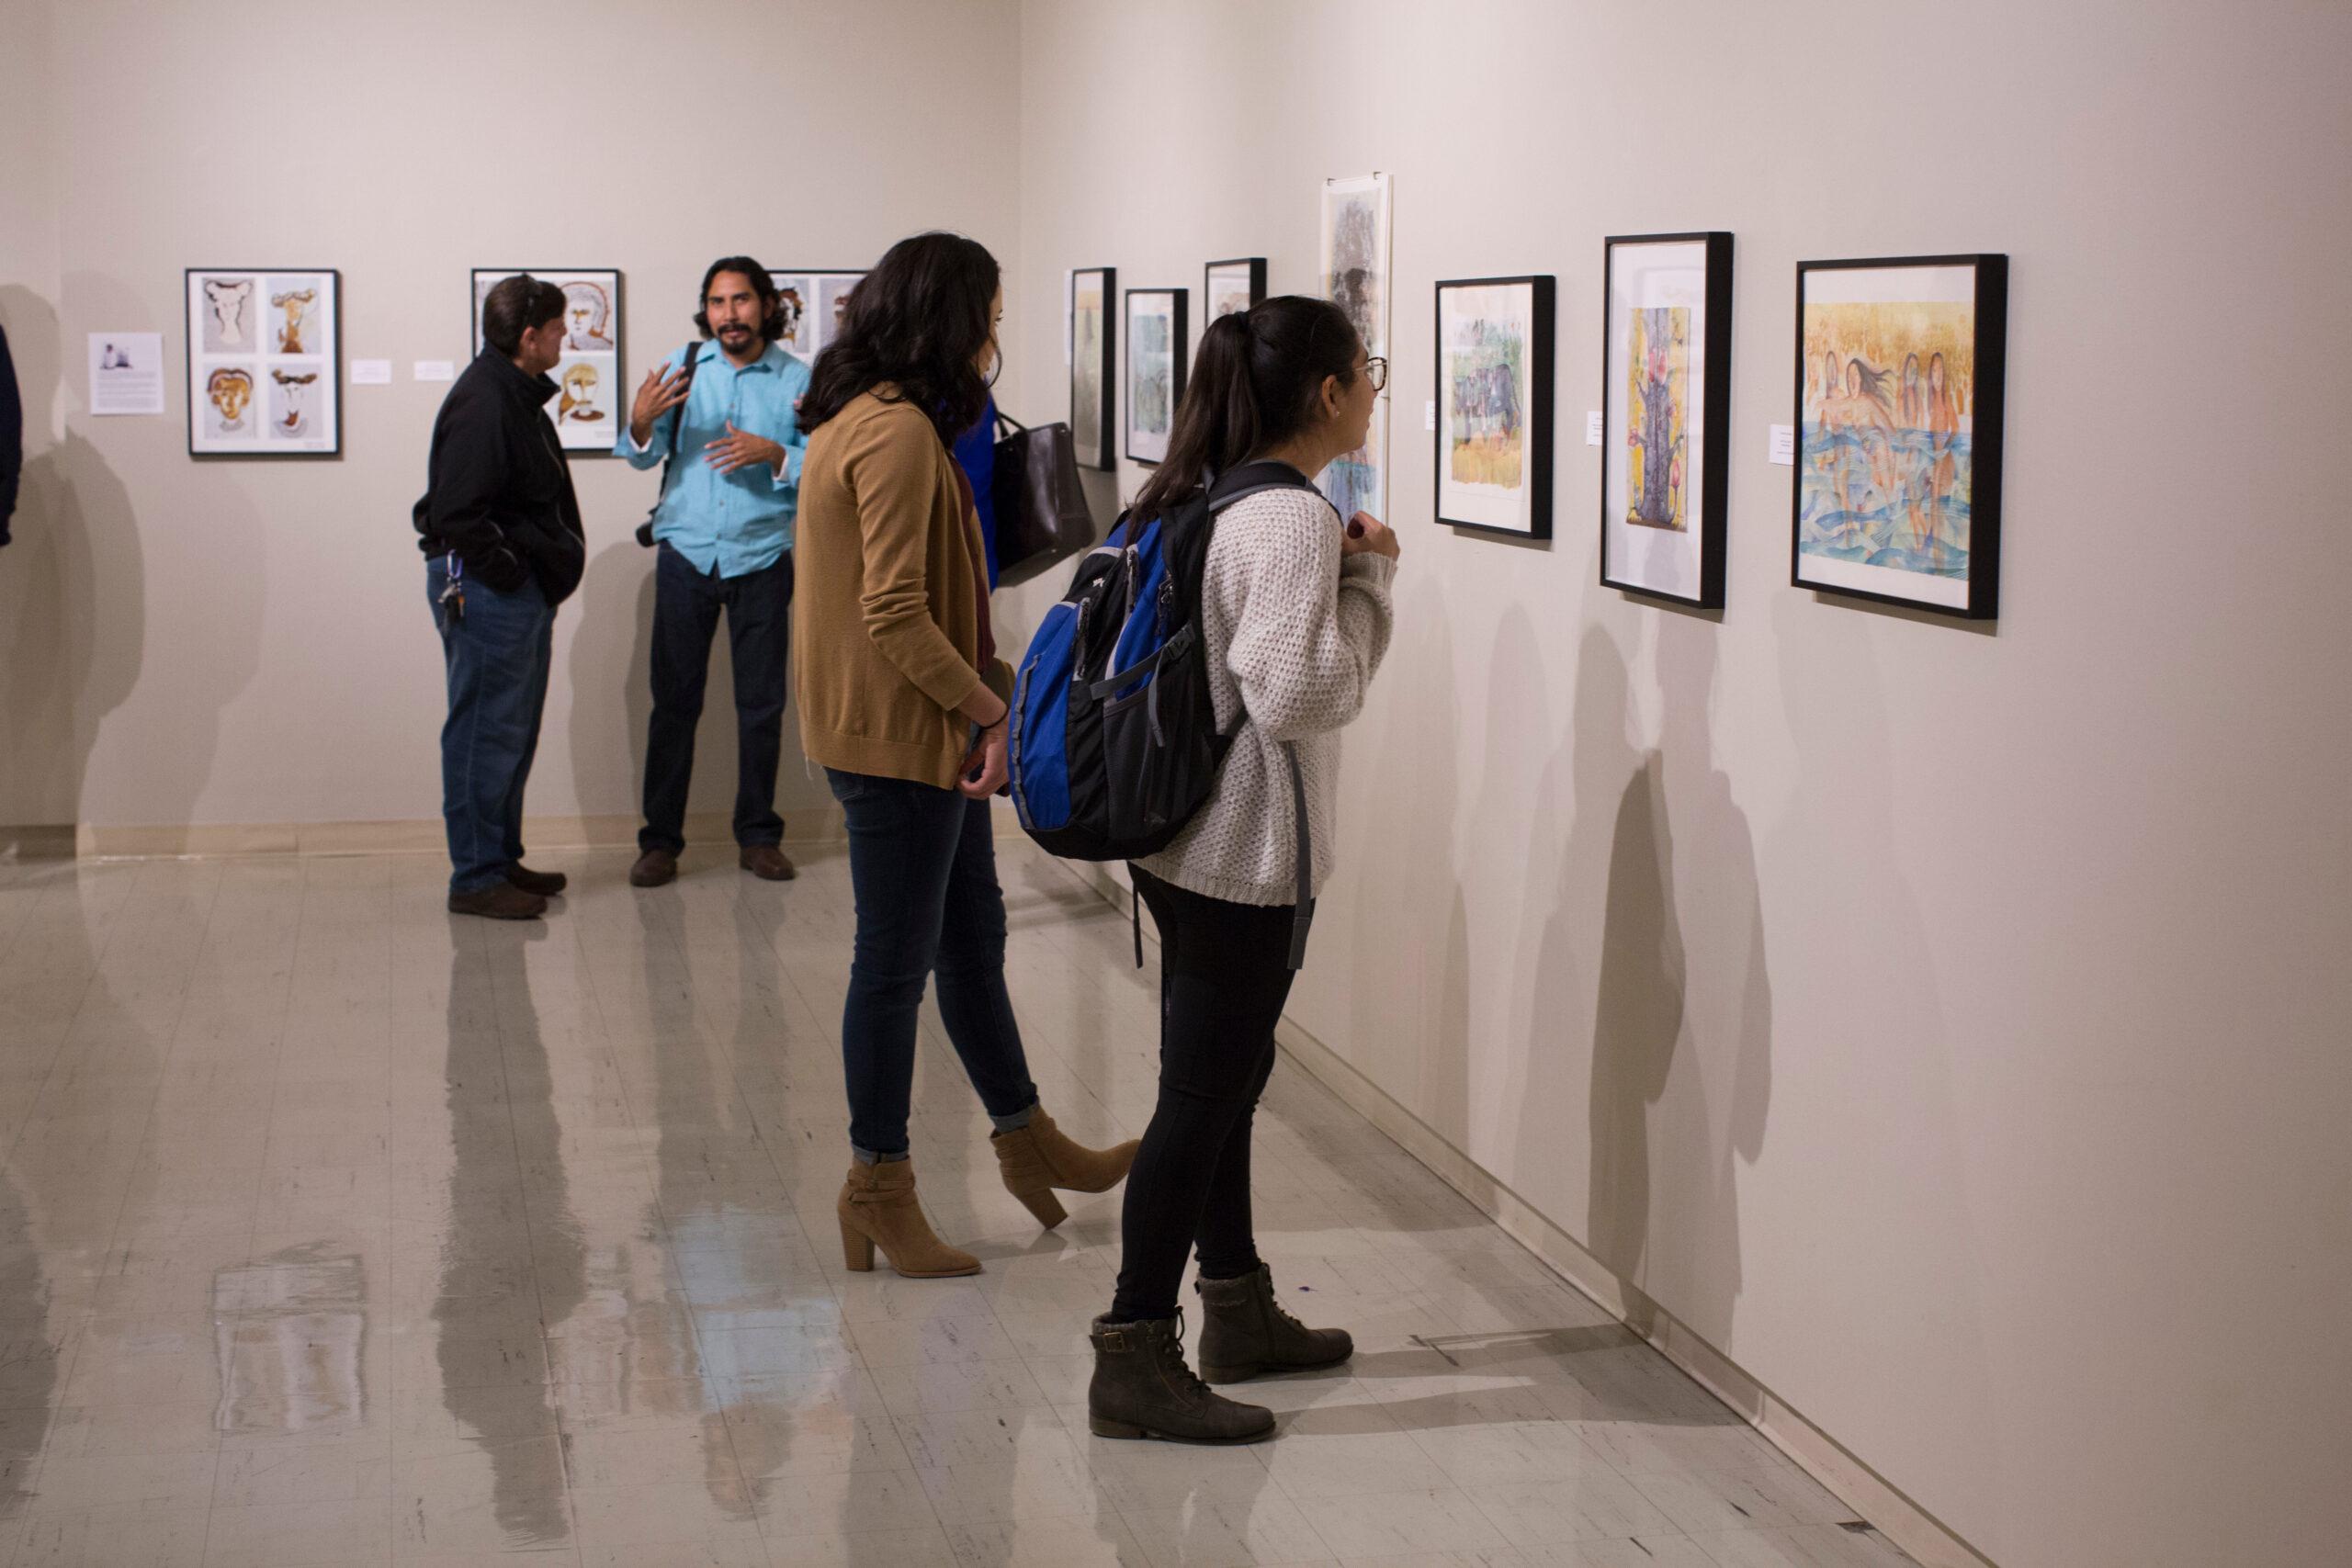 Crossman Art Gallery